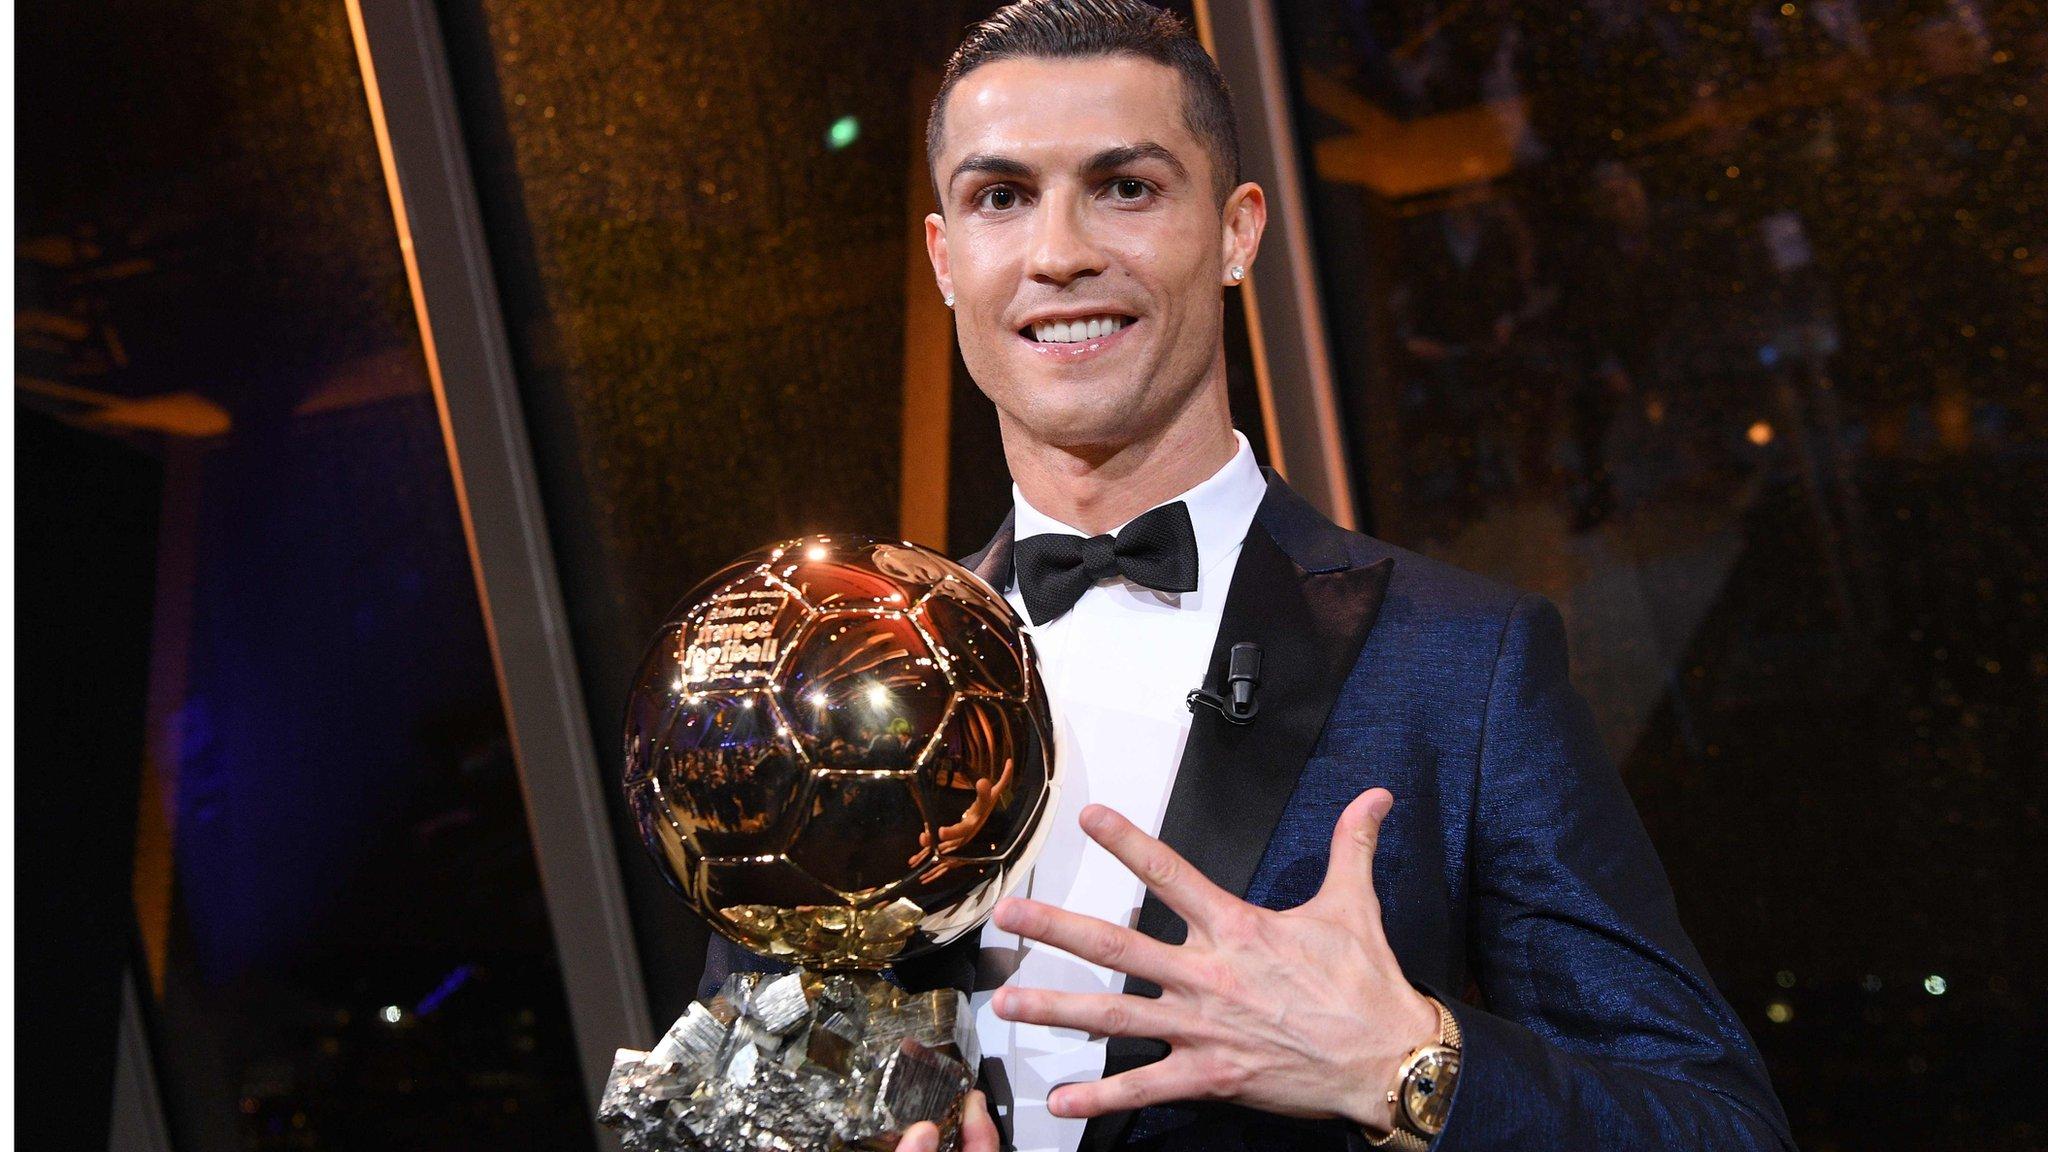 Cristiano Ronaldo: Juventus to sign Real Madrid forward